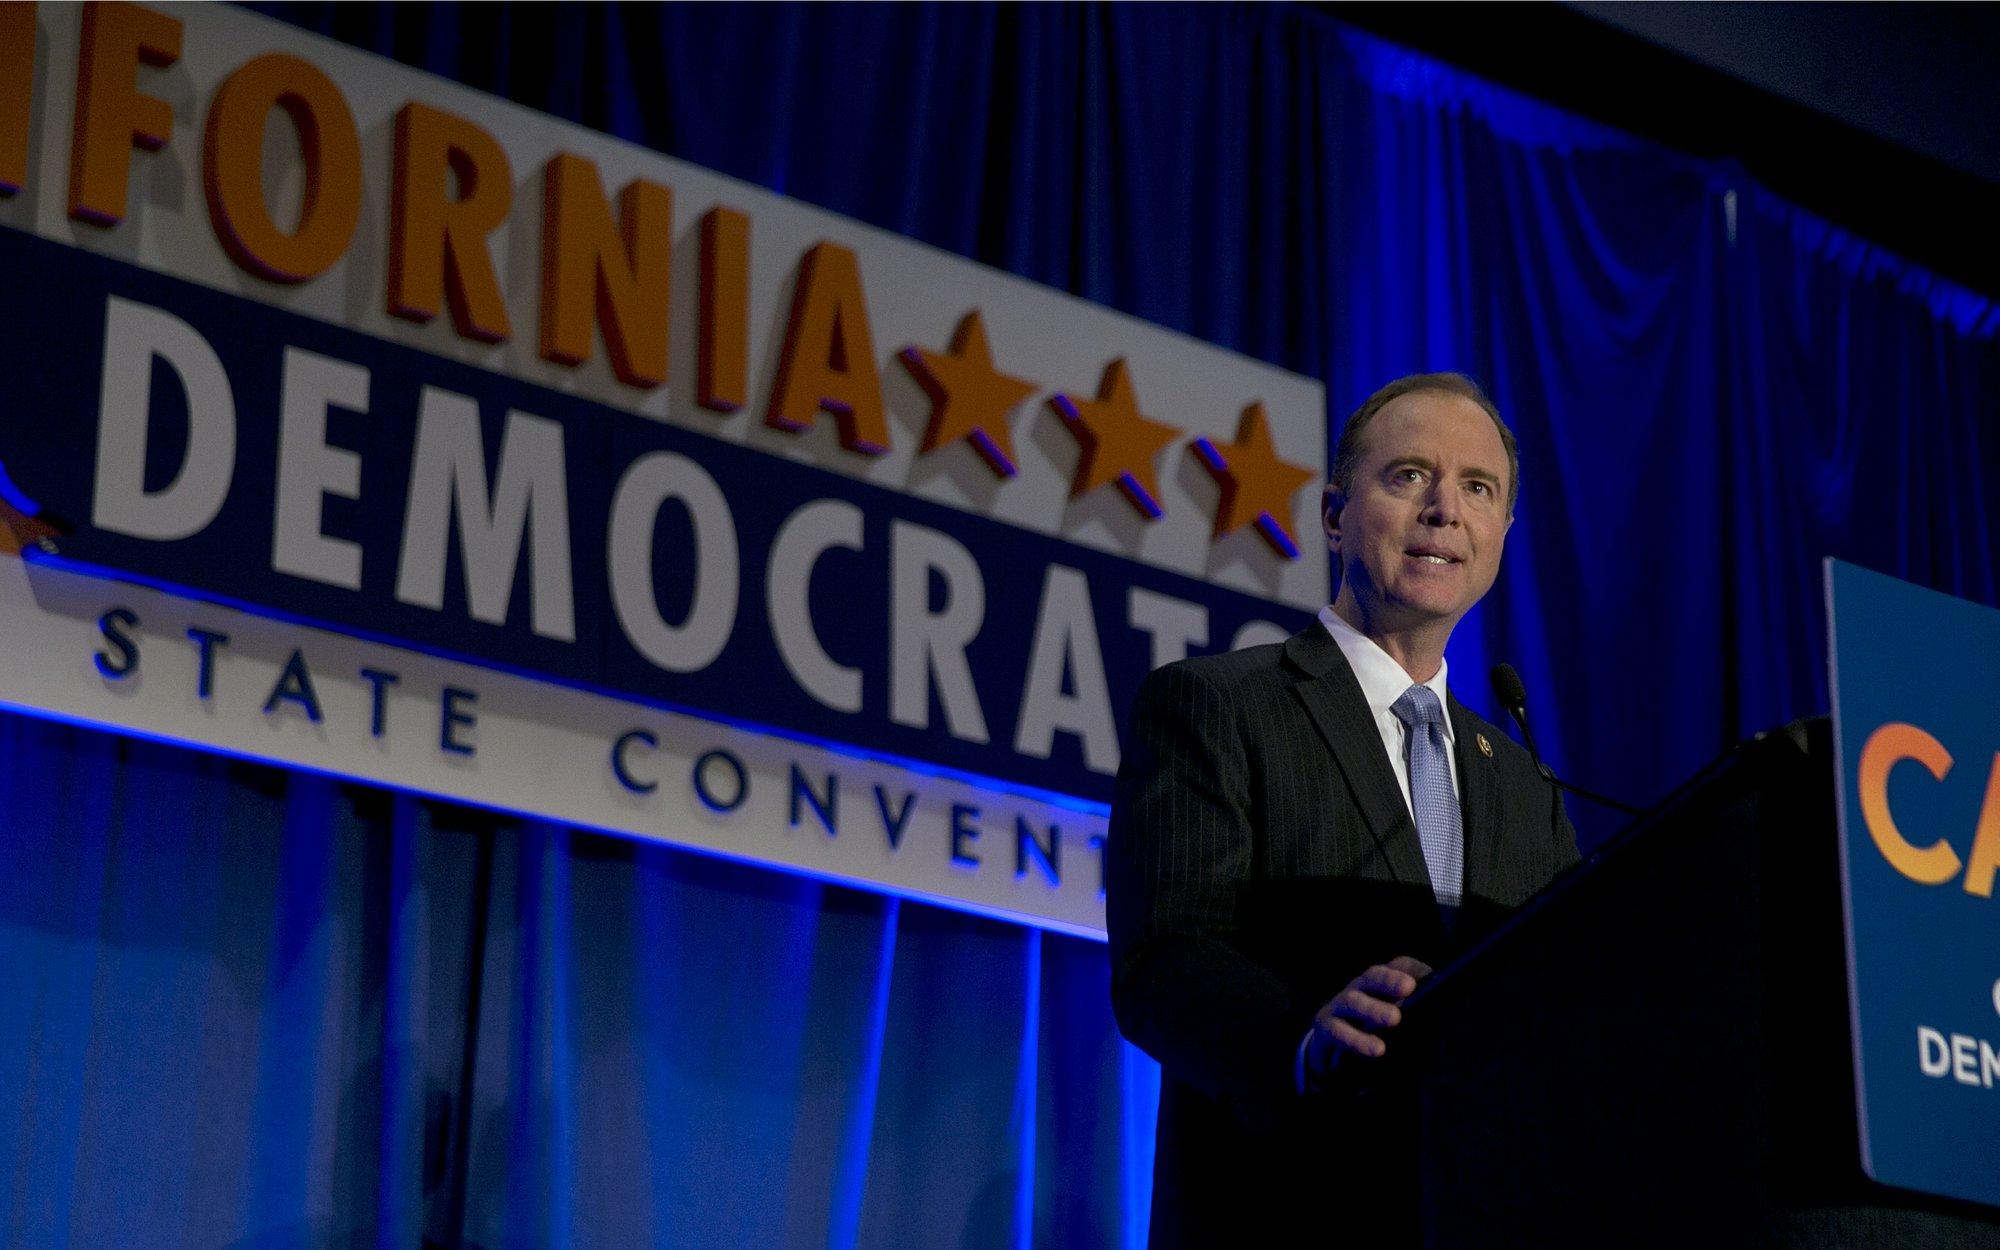 California Democrats take aim at Trump, GOP Congress